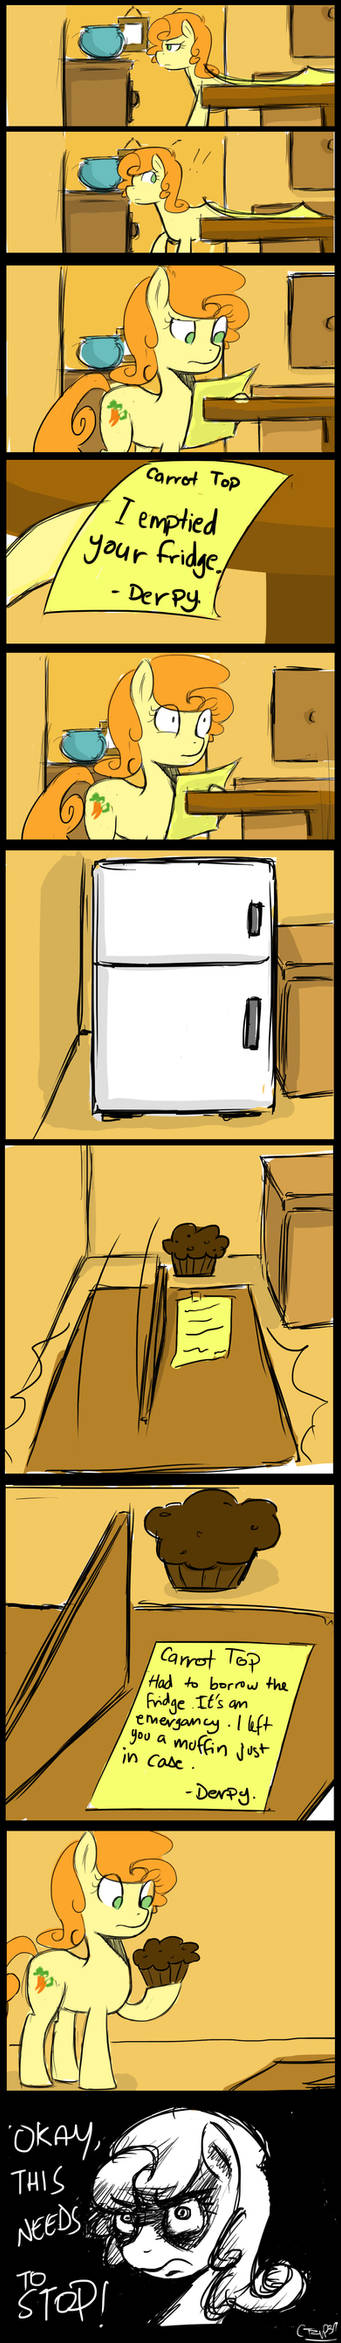 Emptied your fridge